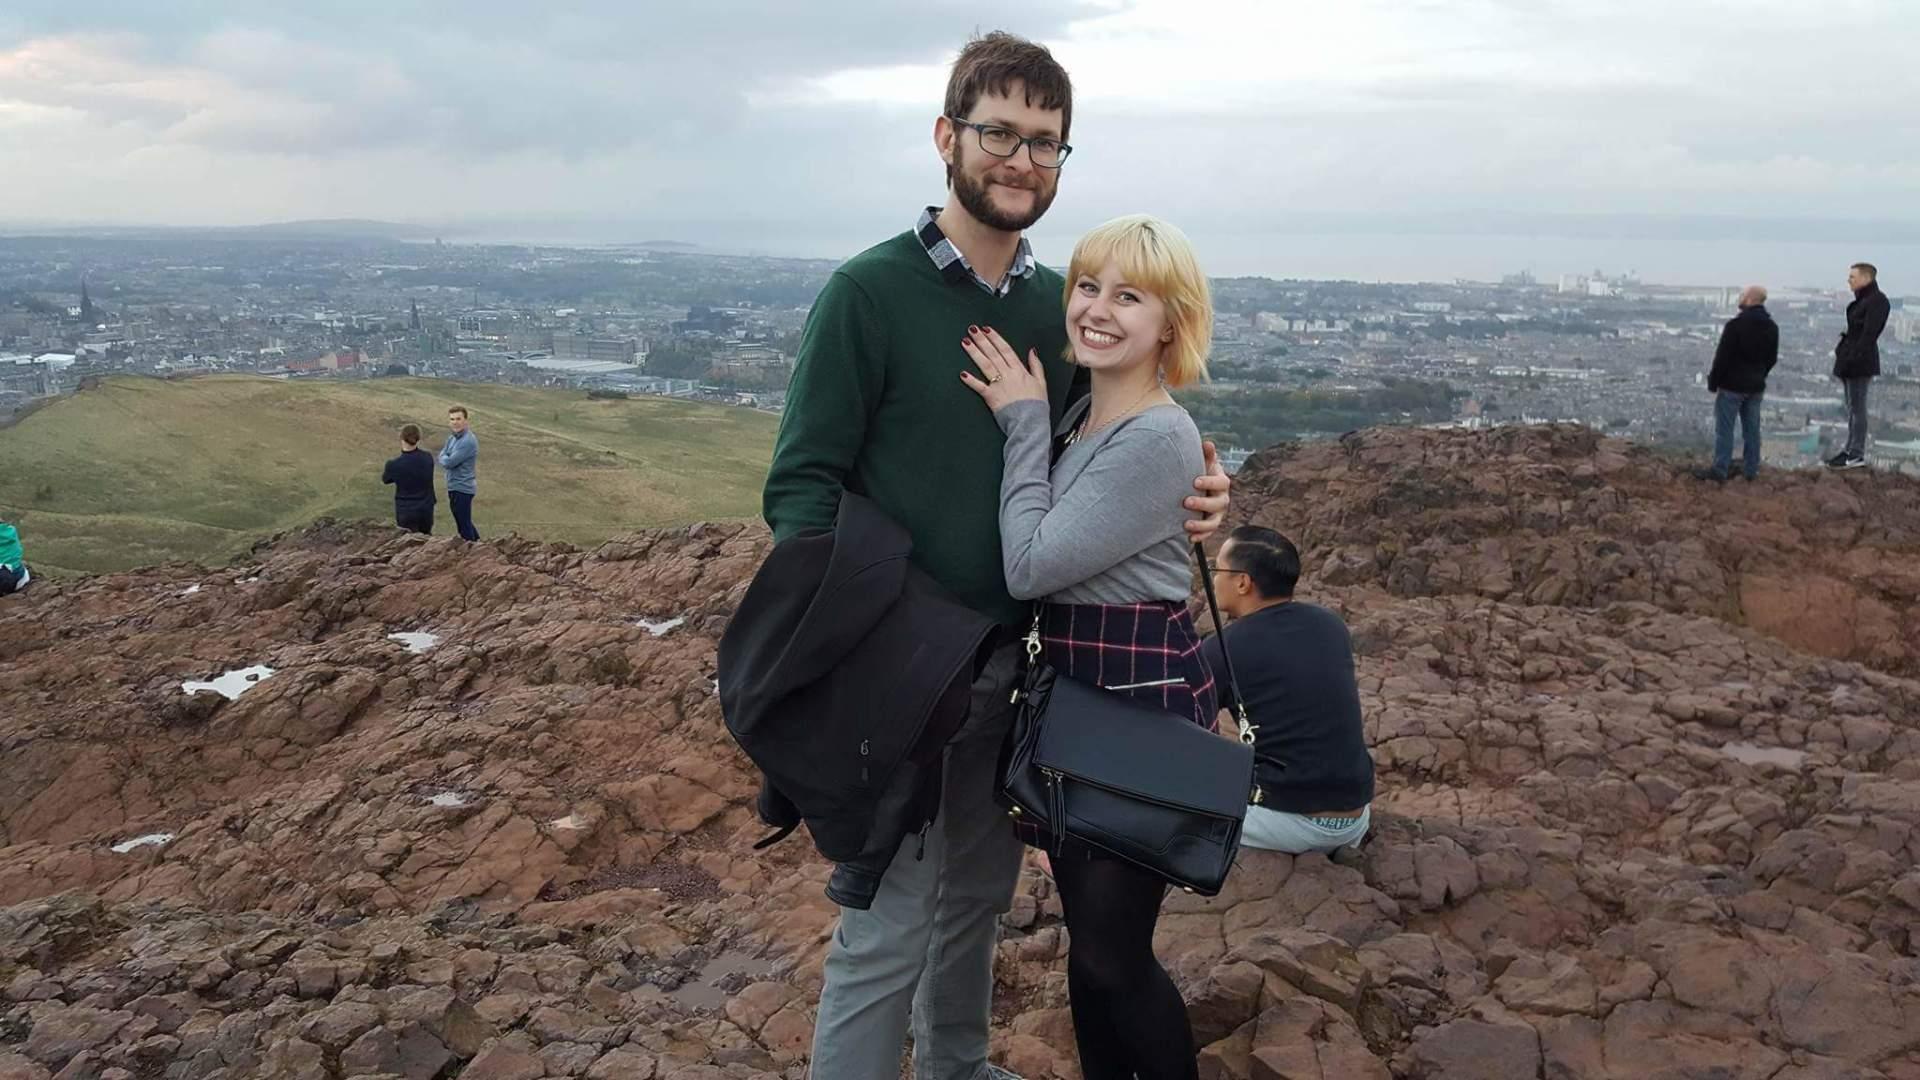 2016 - Engaged in Edinburgh